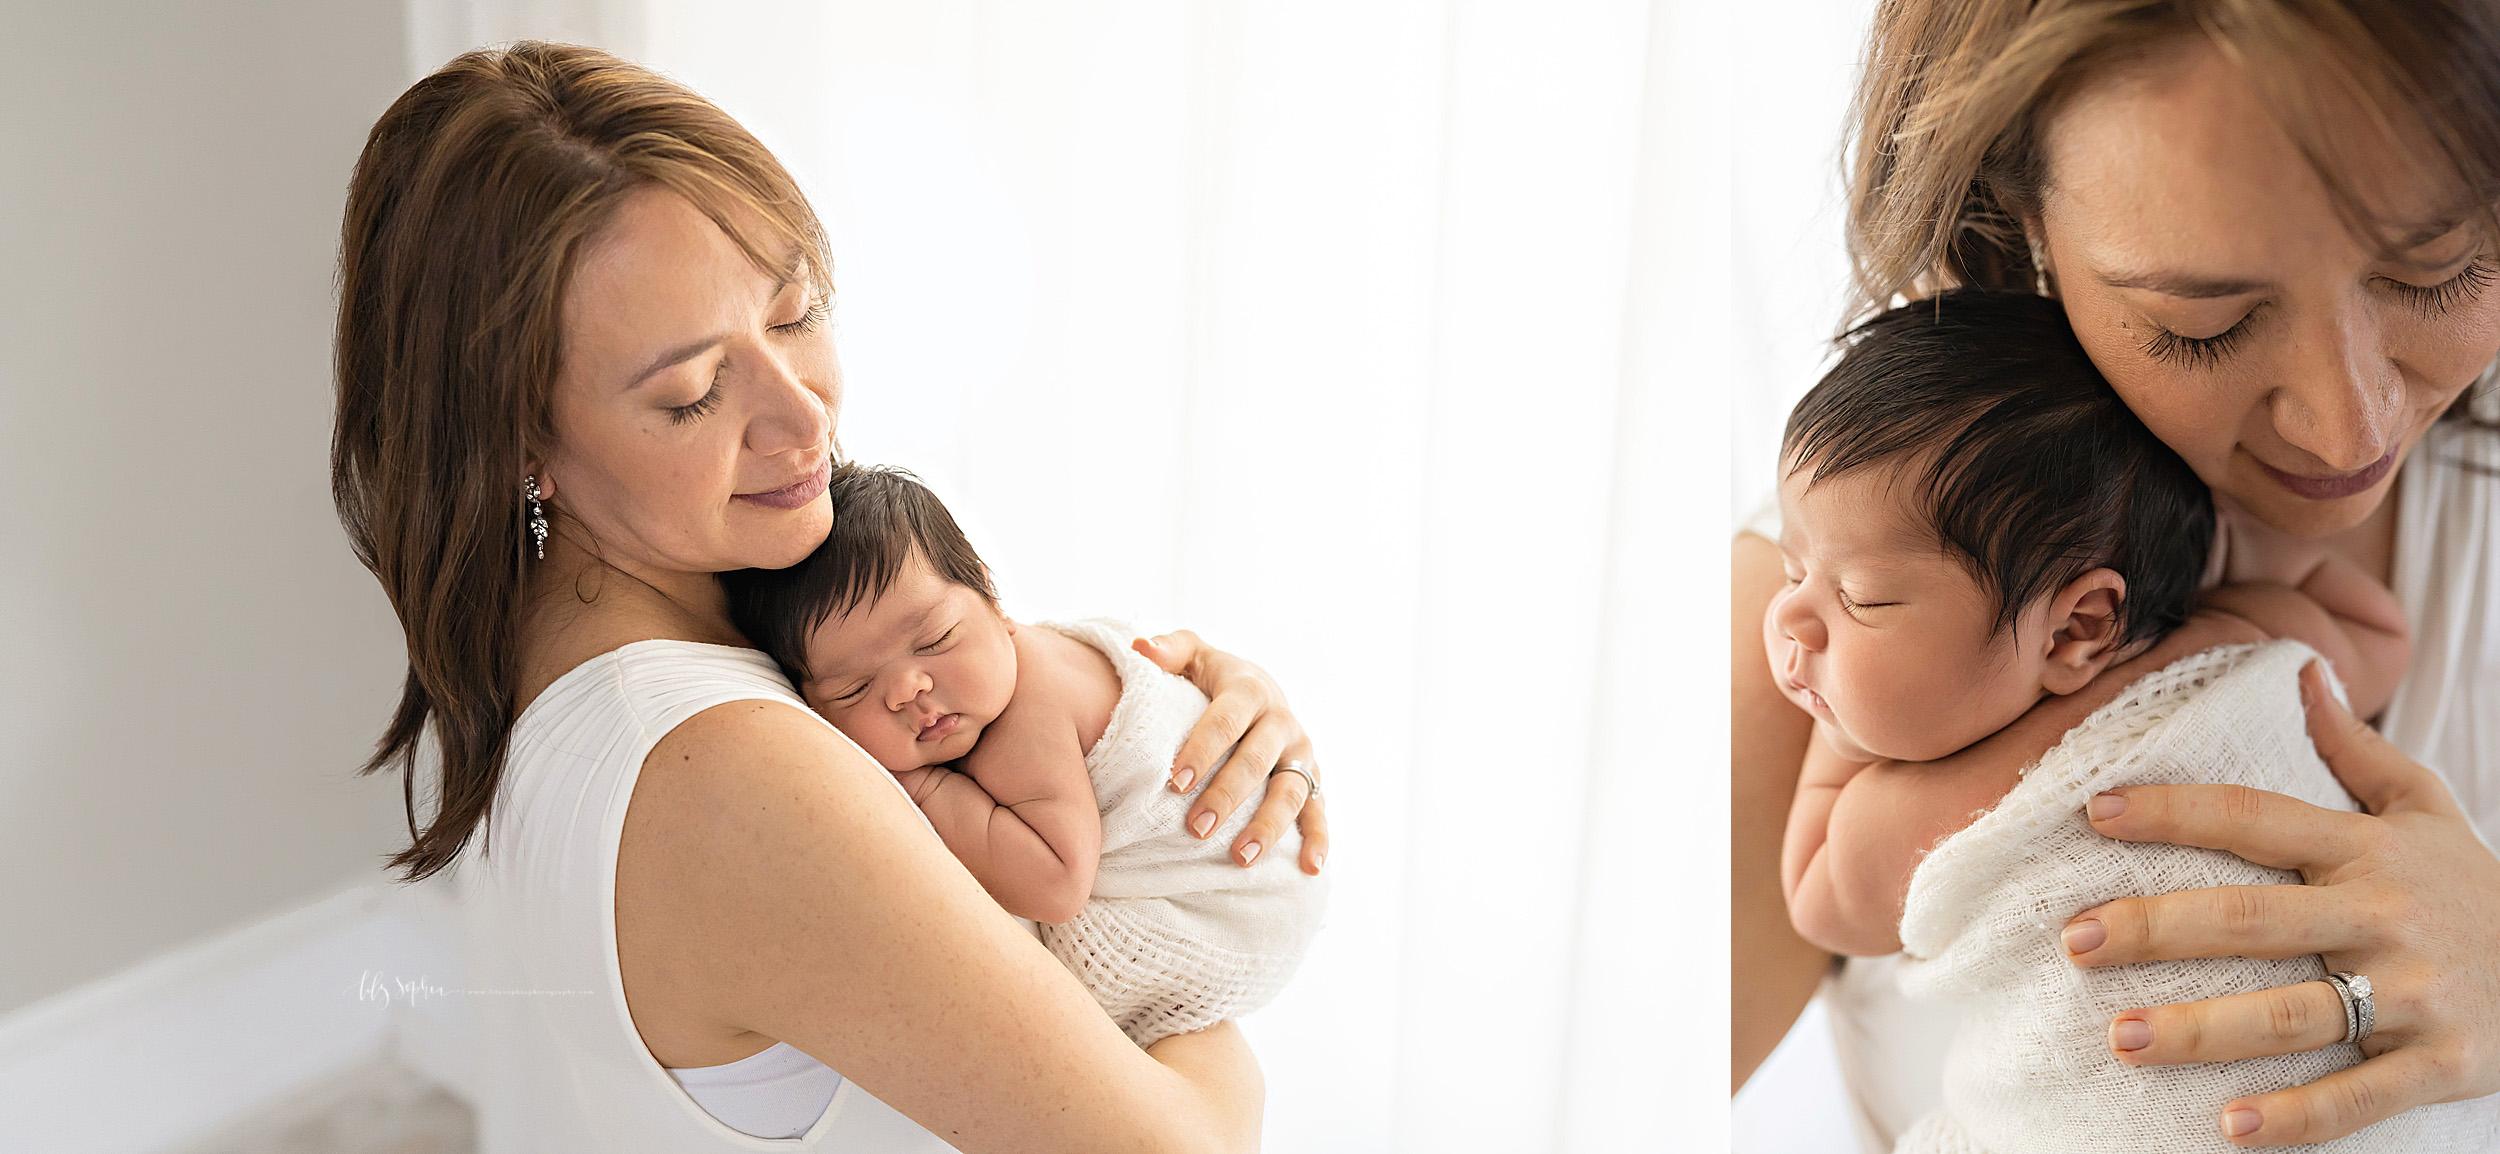 atlanta-smyrna-decatur-sandy-springs-buckhead-virginia-highlands-west-end-decatur-lily-sophia-photography-studio-newborn-baby-girl-toddler-big-brother-family-photos_1339.jpg